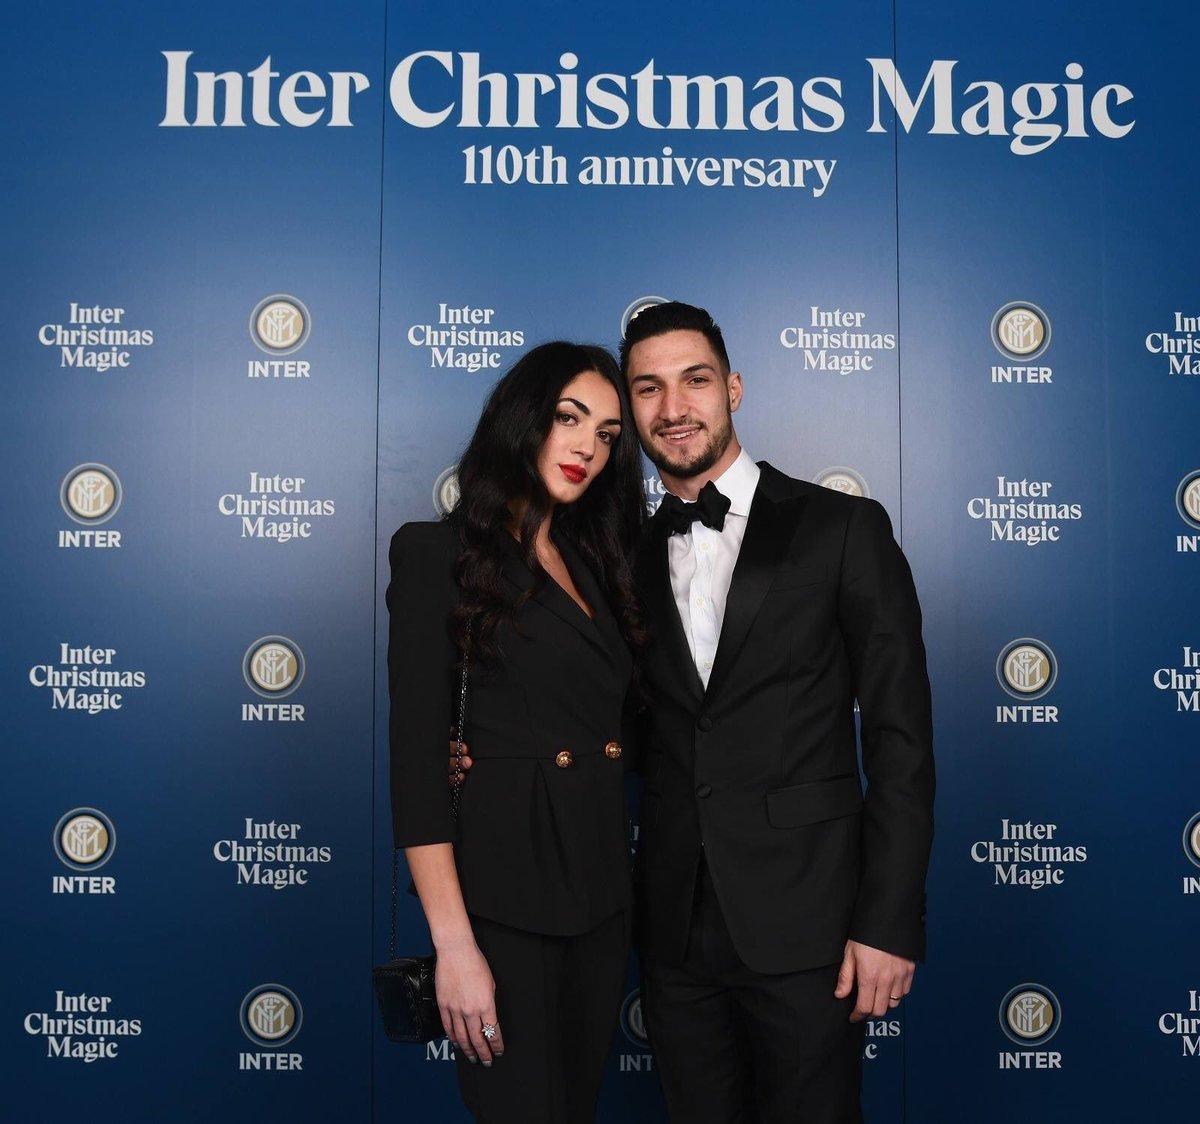 Inter Christmas Magic ⚫🔵